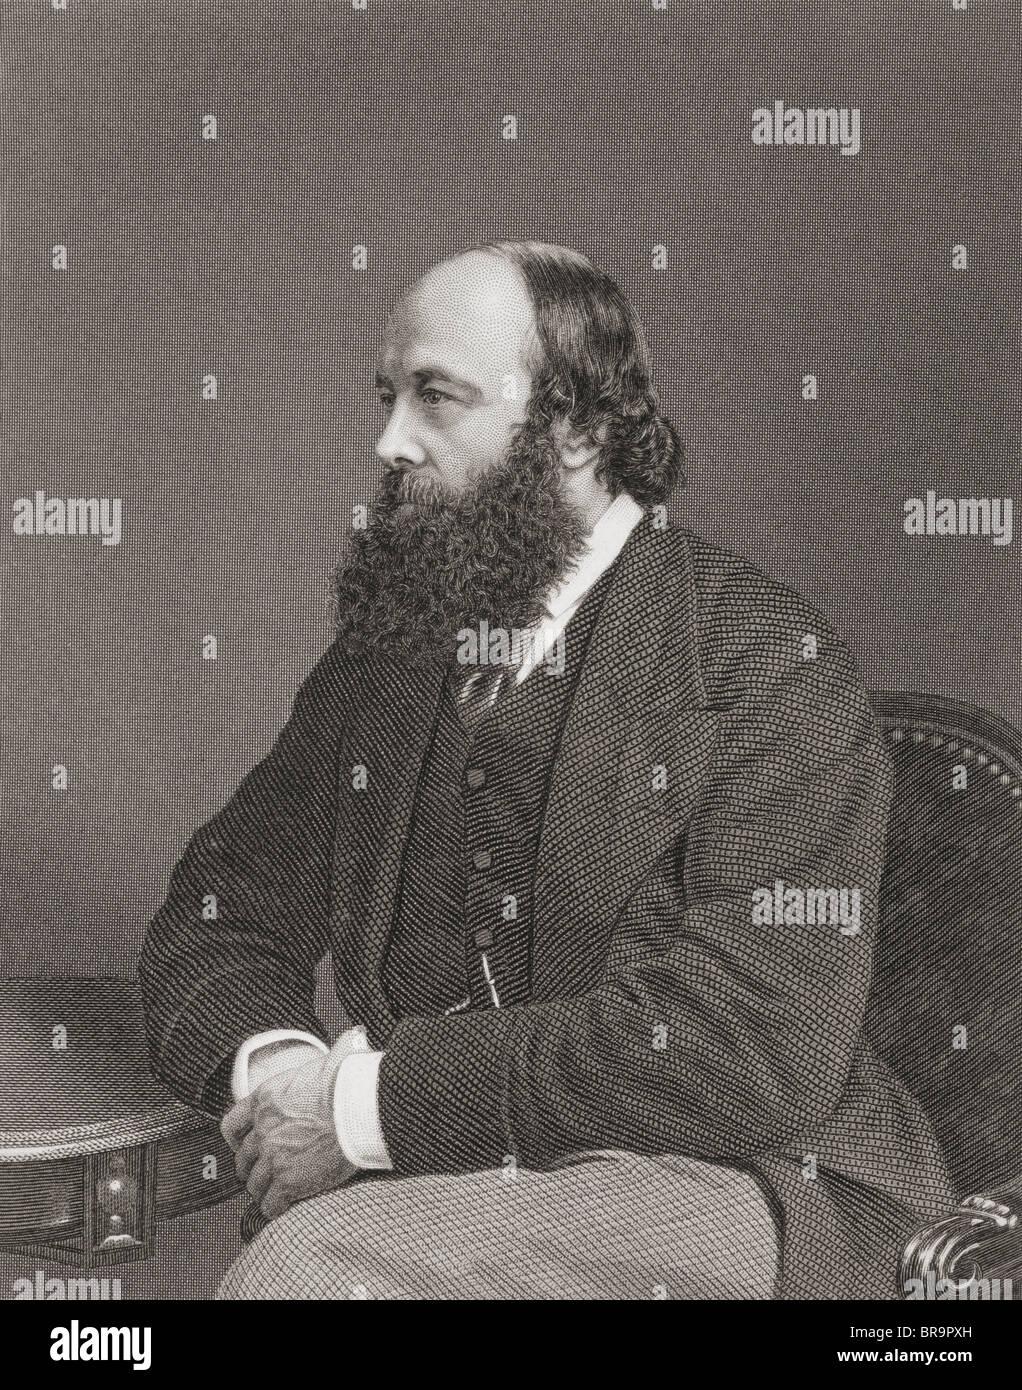 Robert Arthur Talbot Gascoyne-Cecil, 3rd Marquess of Salisbury, 1830 to 1903. British Conservative statesman and - Stock Image